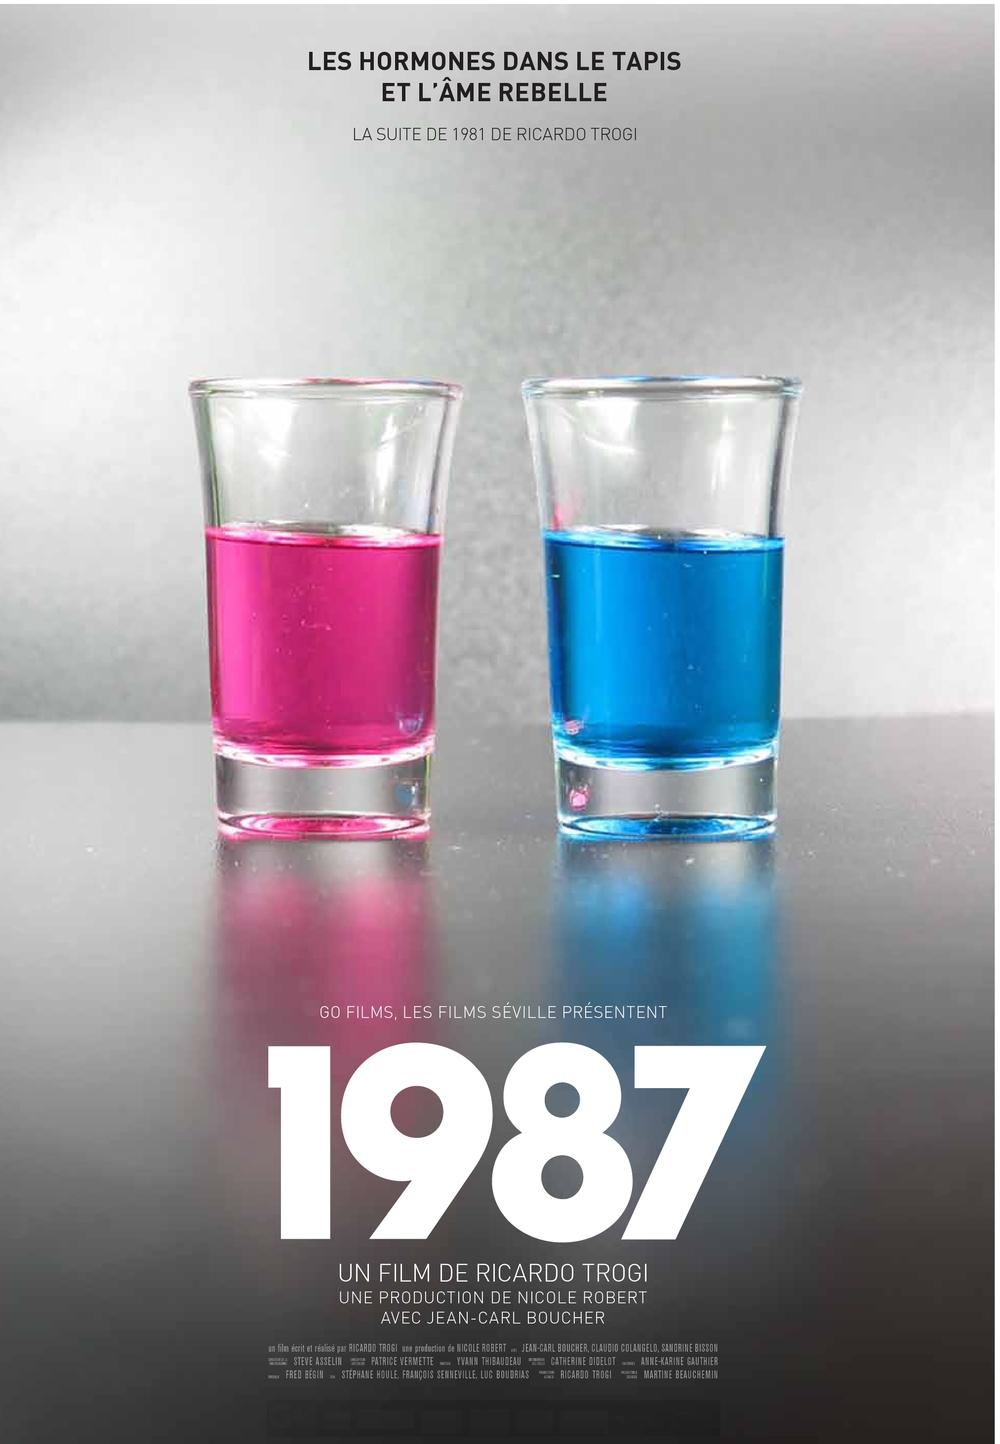 RENZO-1987-poster-concepts-31mars_00001.jpg